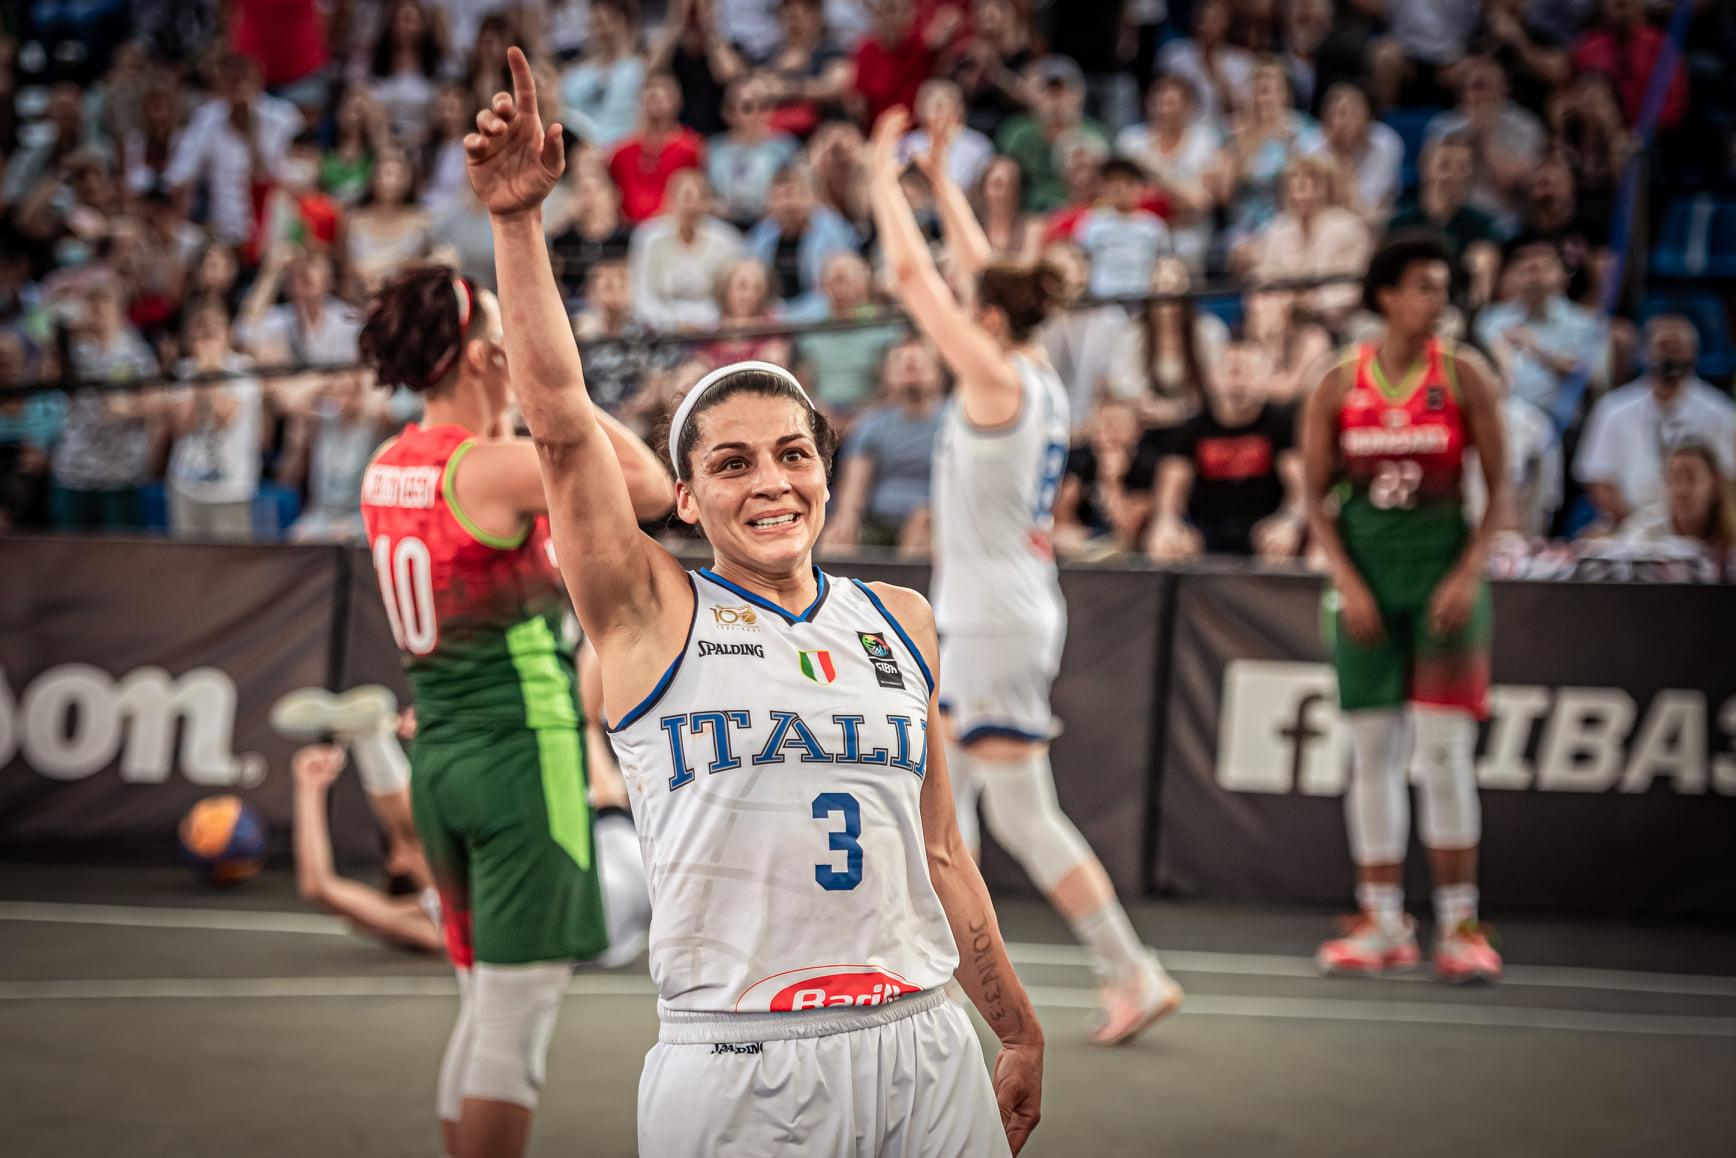 3×3 femminile: l'Italia batte l'Ungheria 13-12 e va alle Olimpiadi di Tokyo 2021!!!